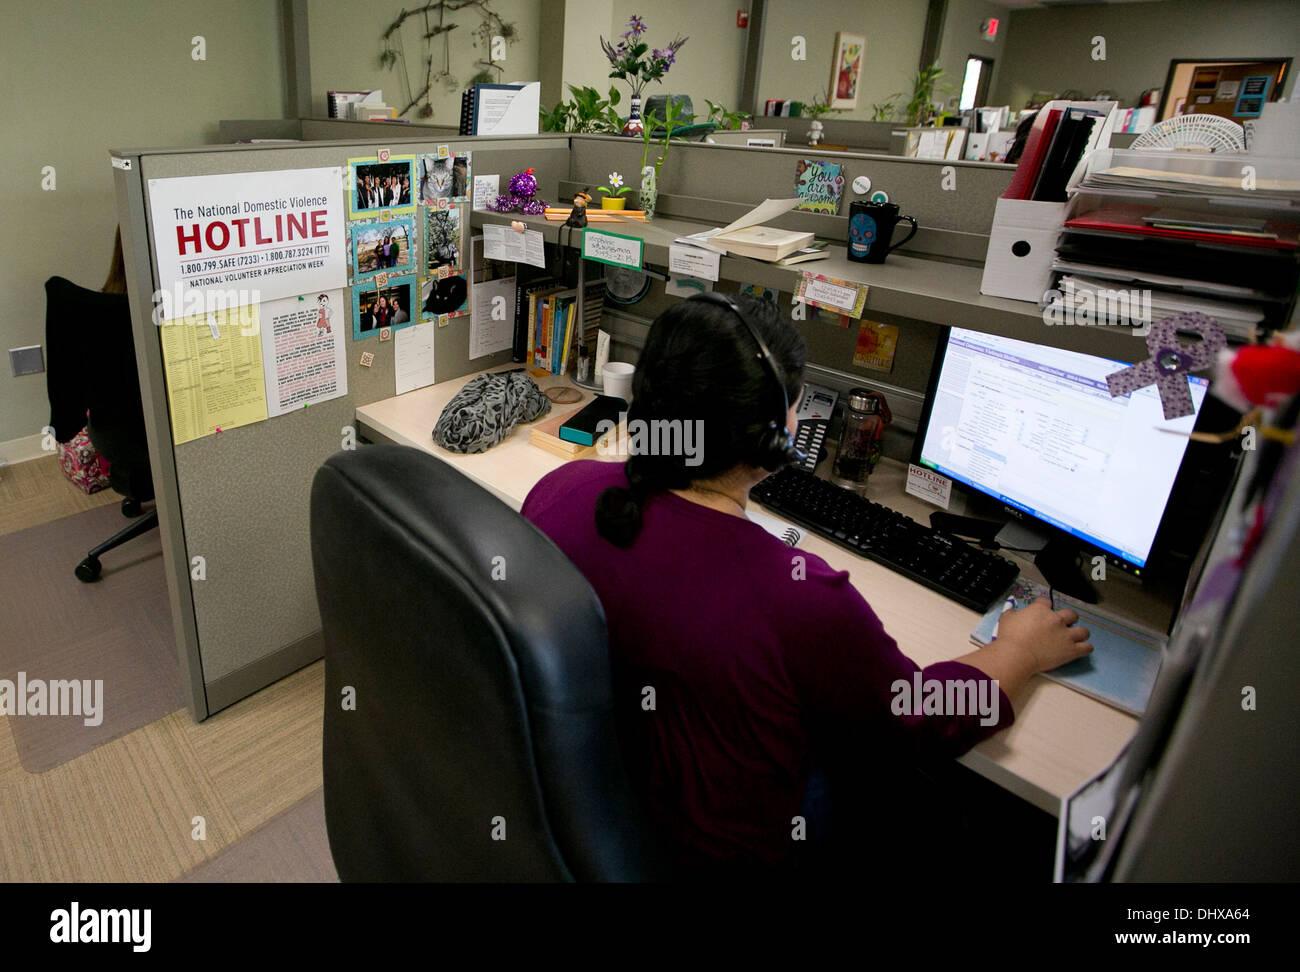 Dating numero hotline abuso incontri hjemmesider per unge gratis